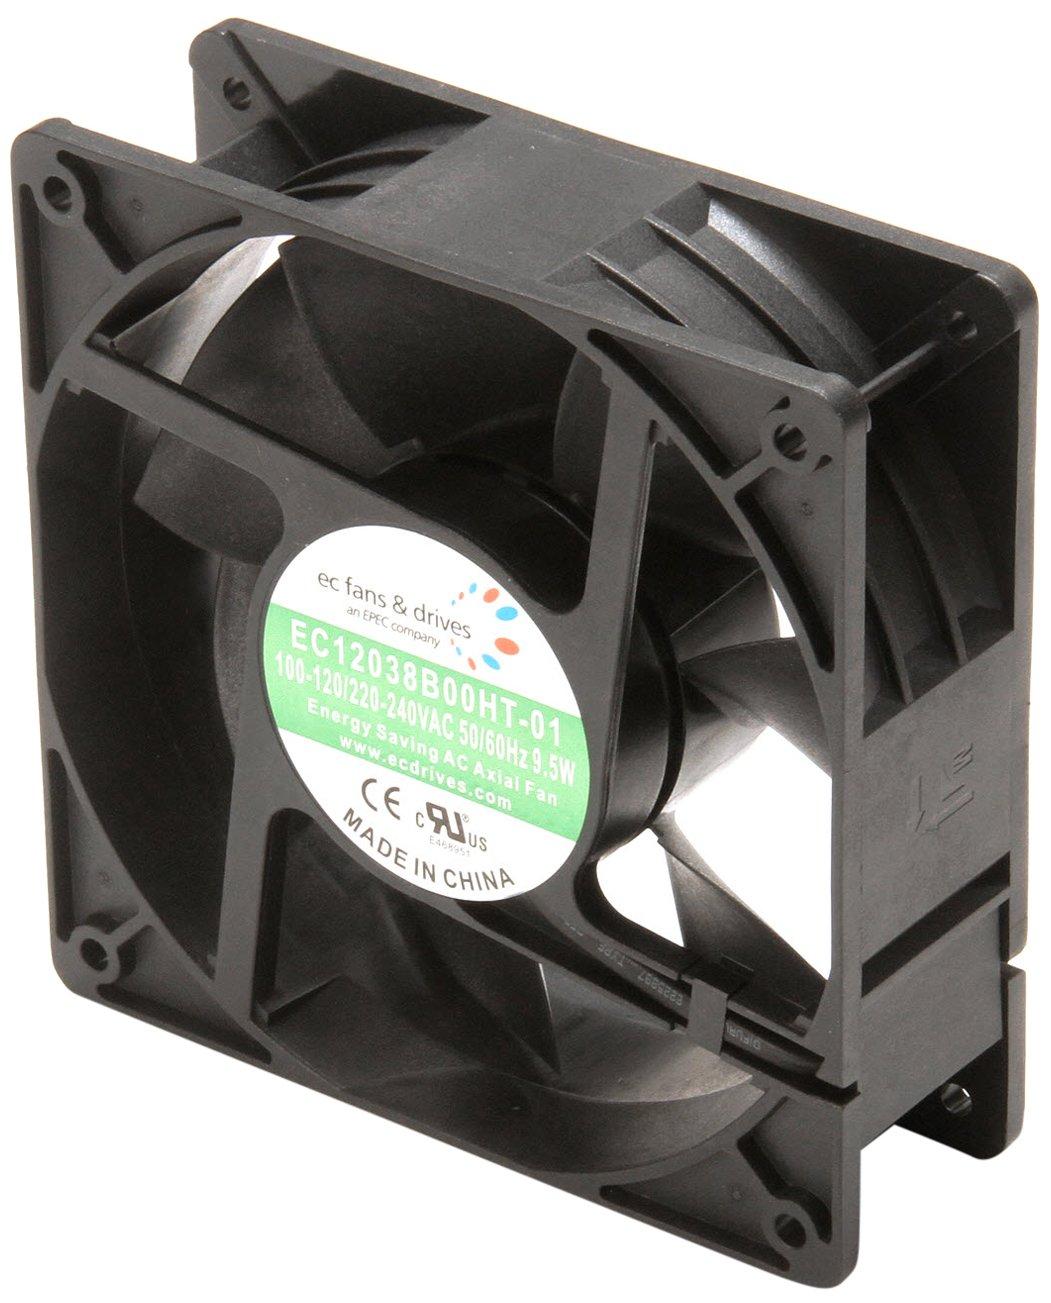 Norlake 150511 Fan Motor 100-240V Ec12038B00H